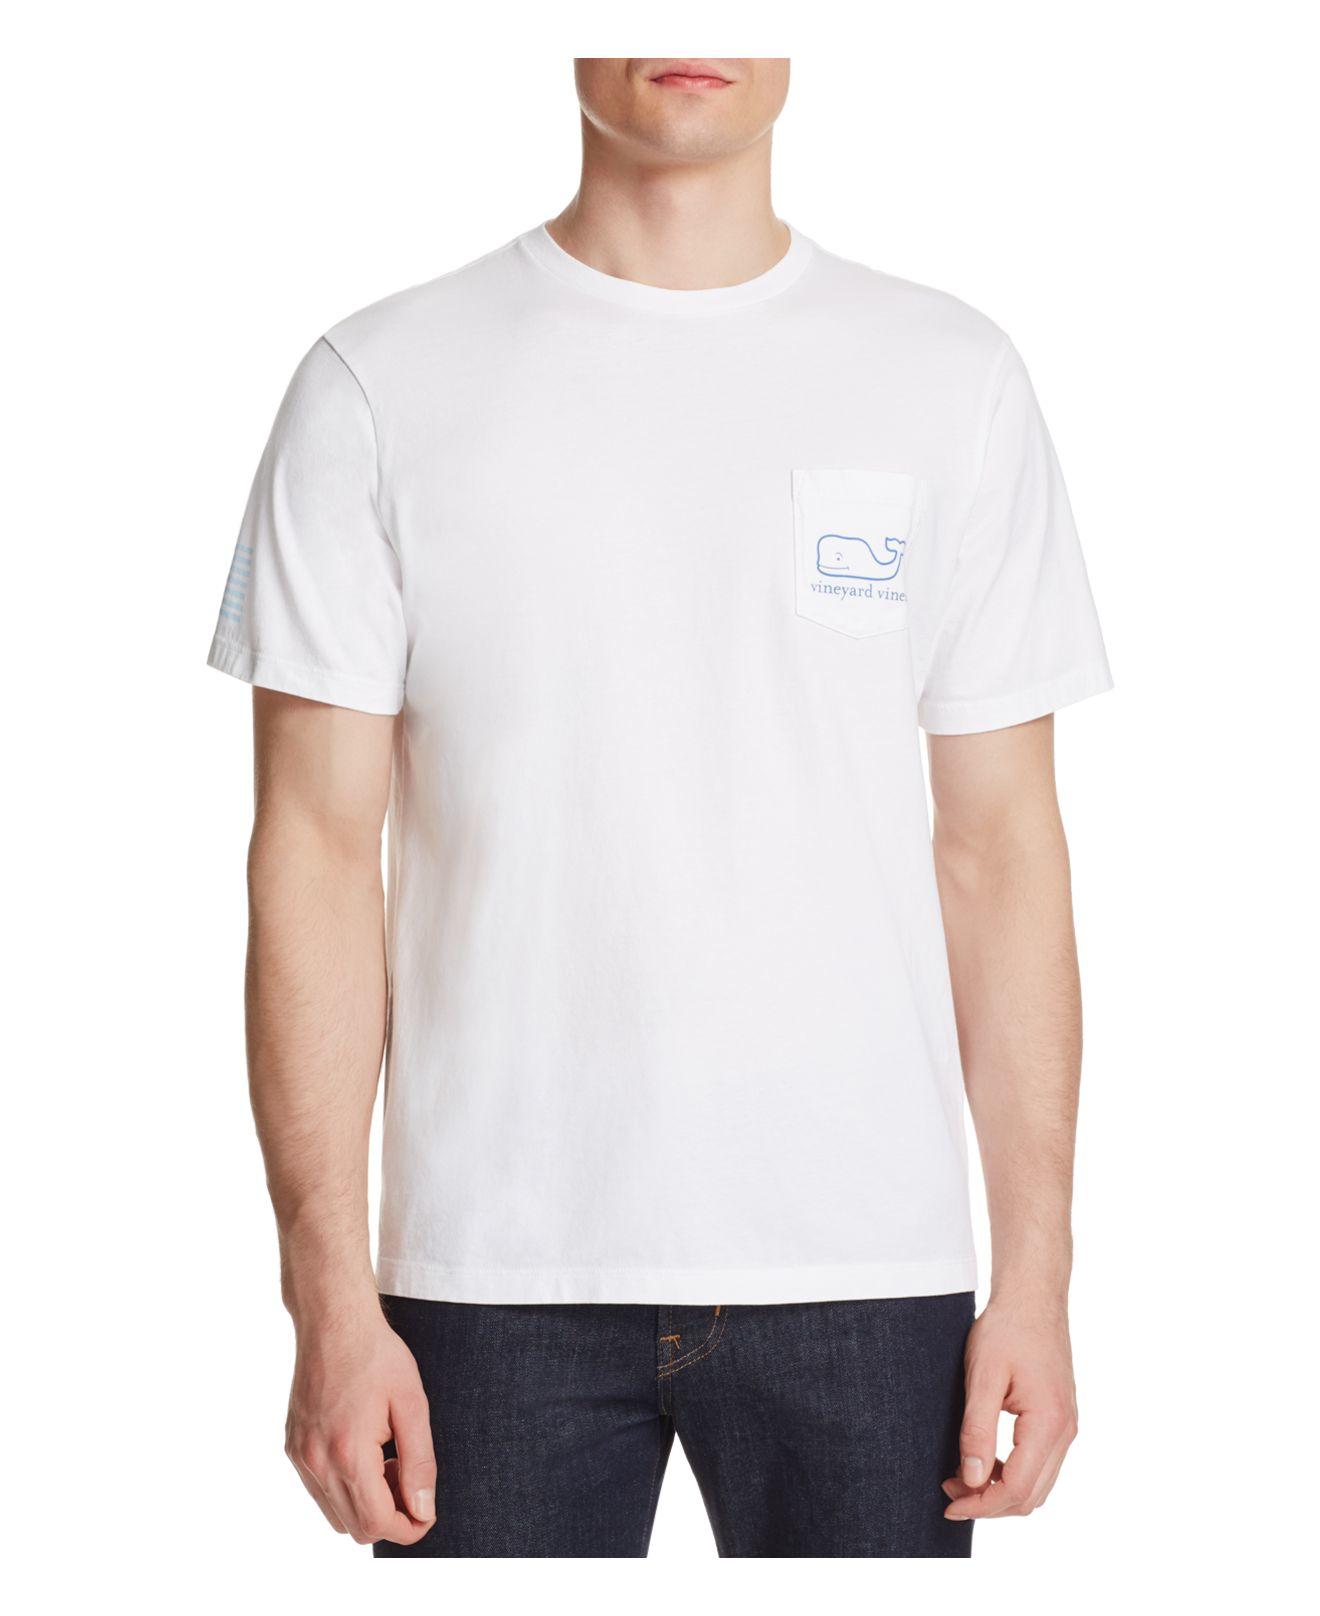 Vineyard vines fisher wake graphic tee in white for men lyst for Vineyard vines fishing shirt